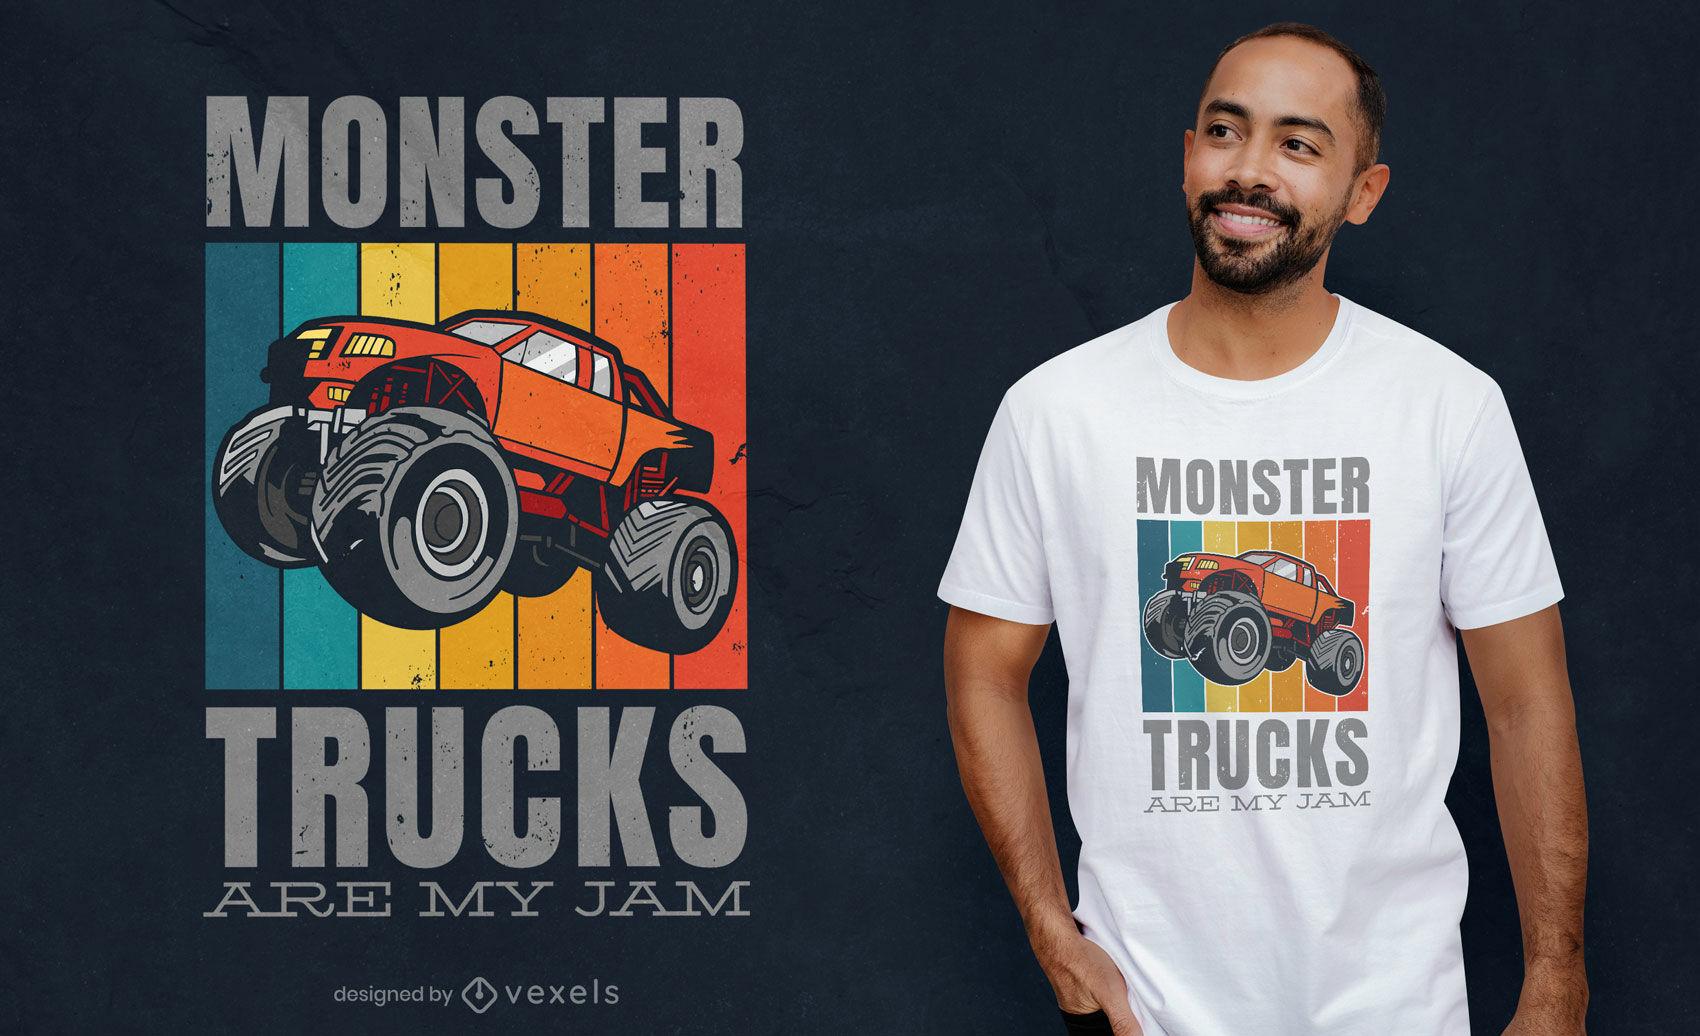 Monster truck fan quote t-shirt design